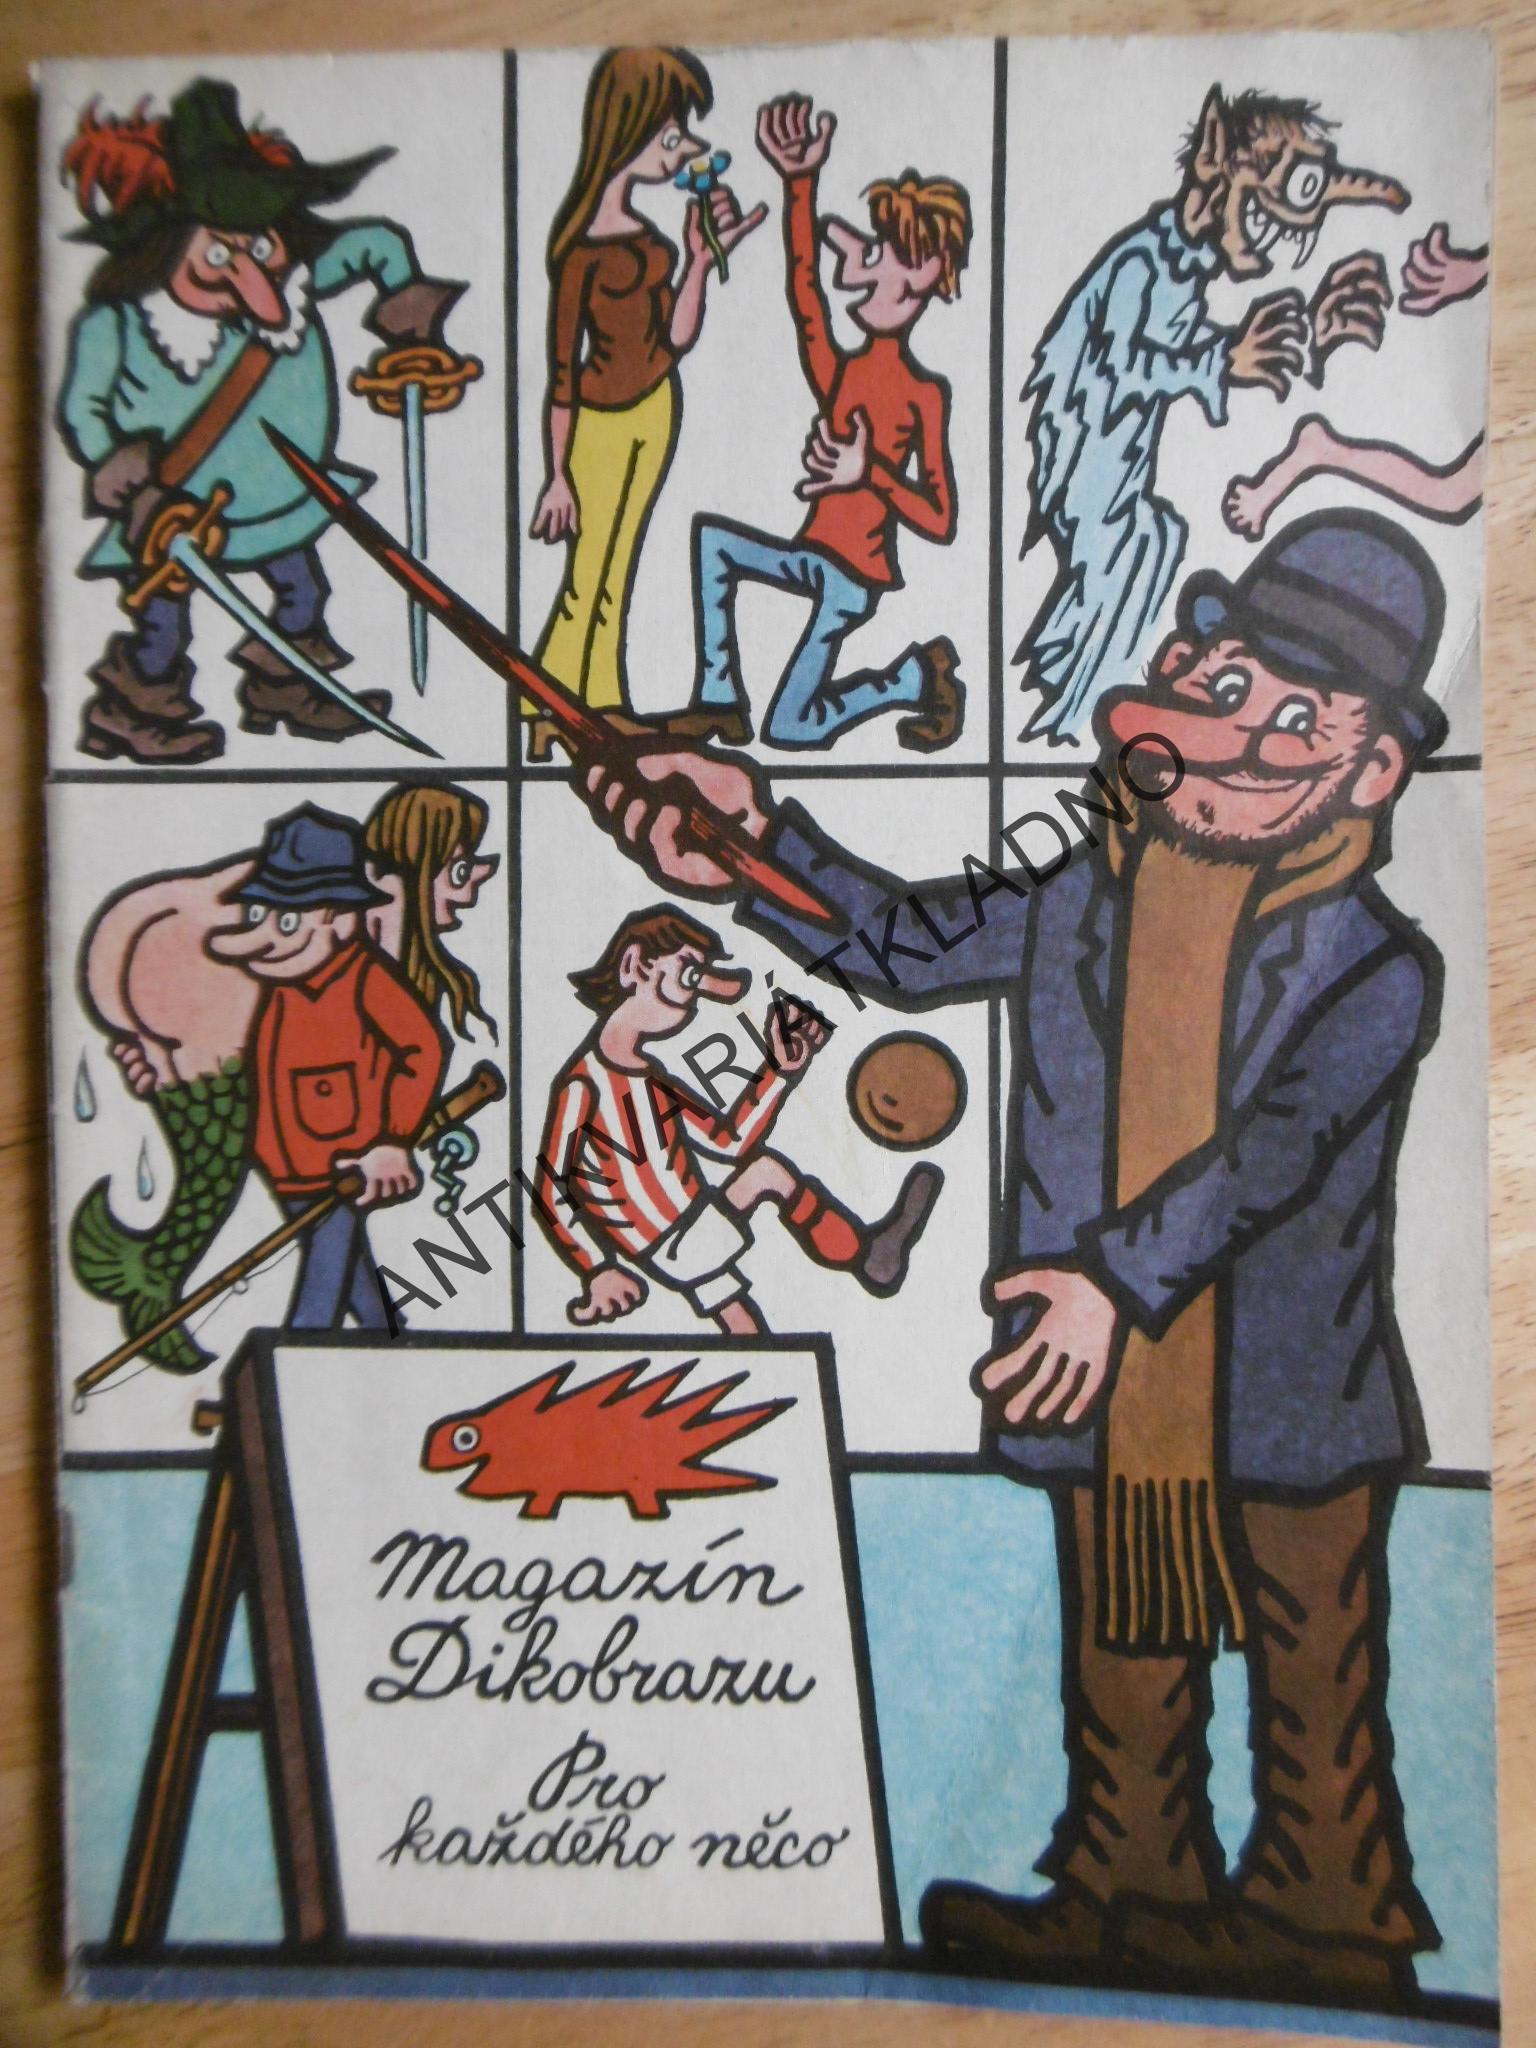 Magazin Dikobrazu 1975 Antikvariat Kladno Mares